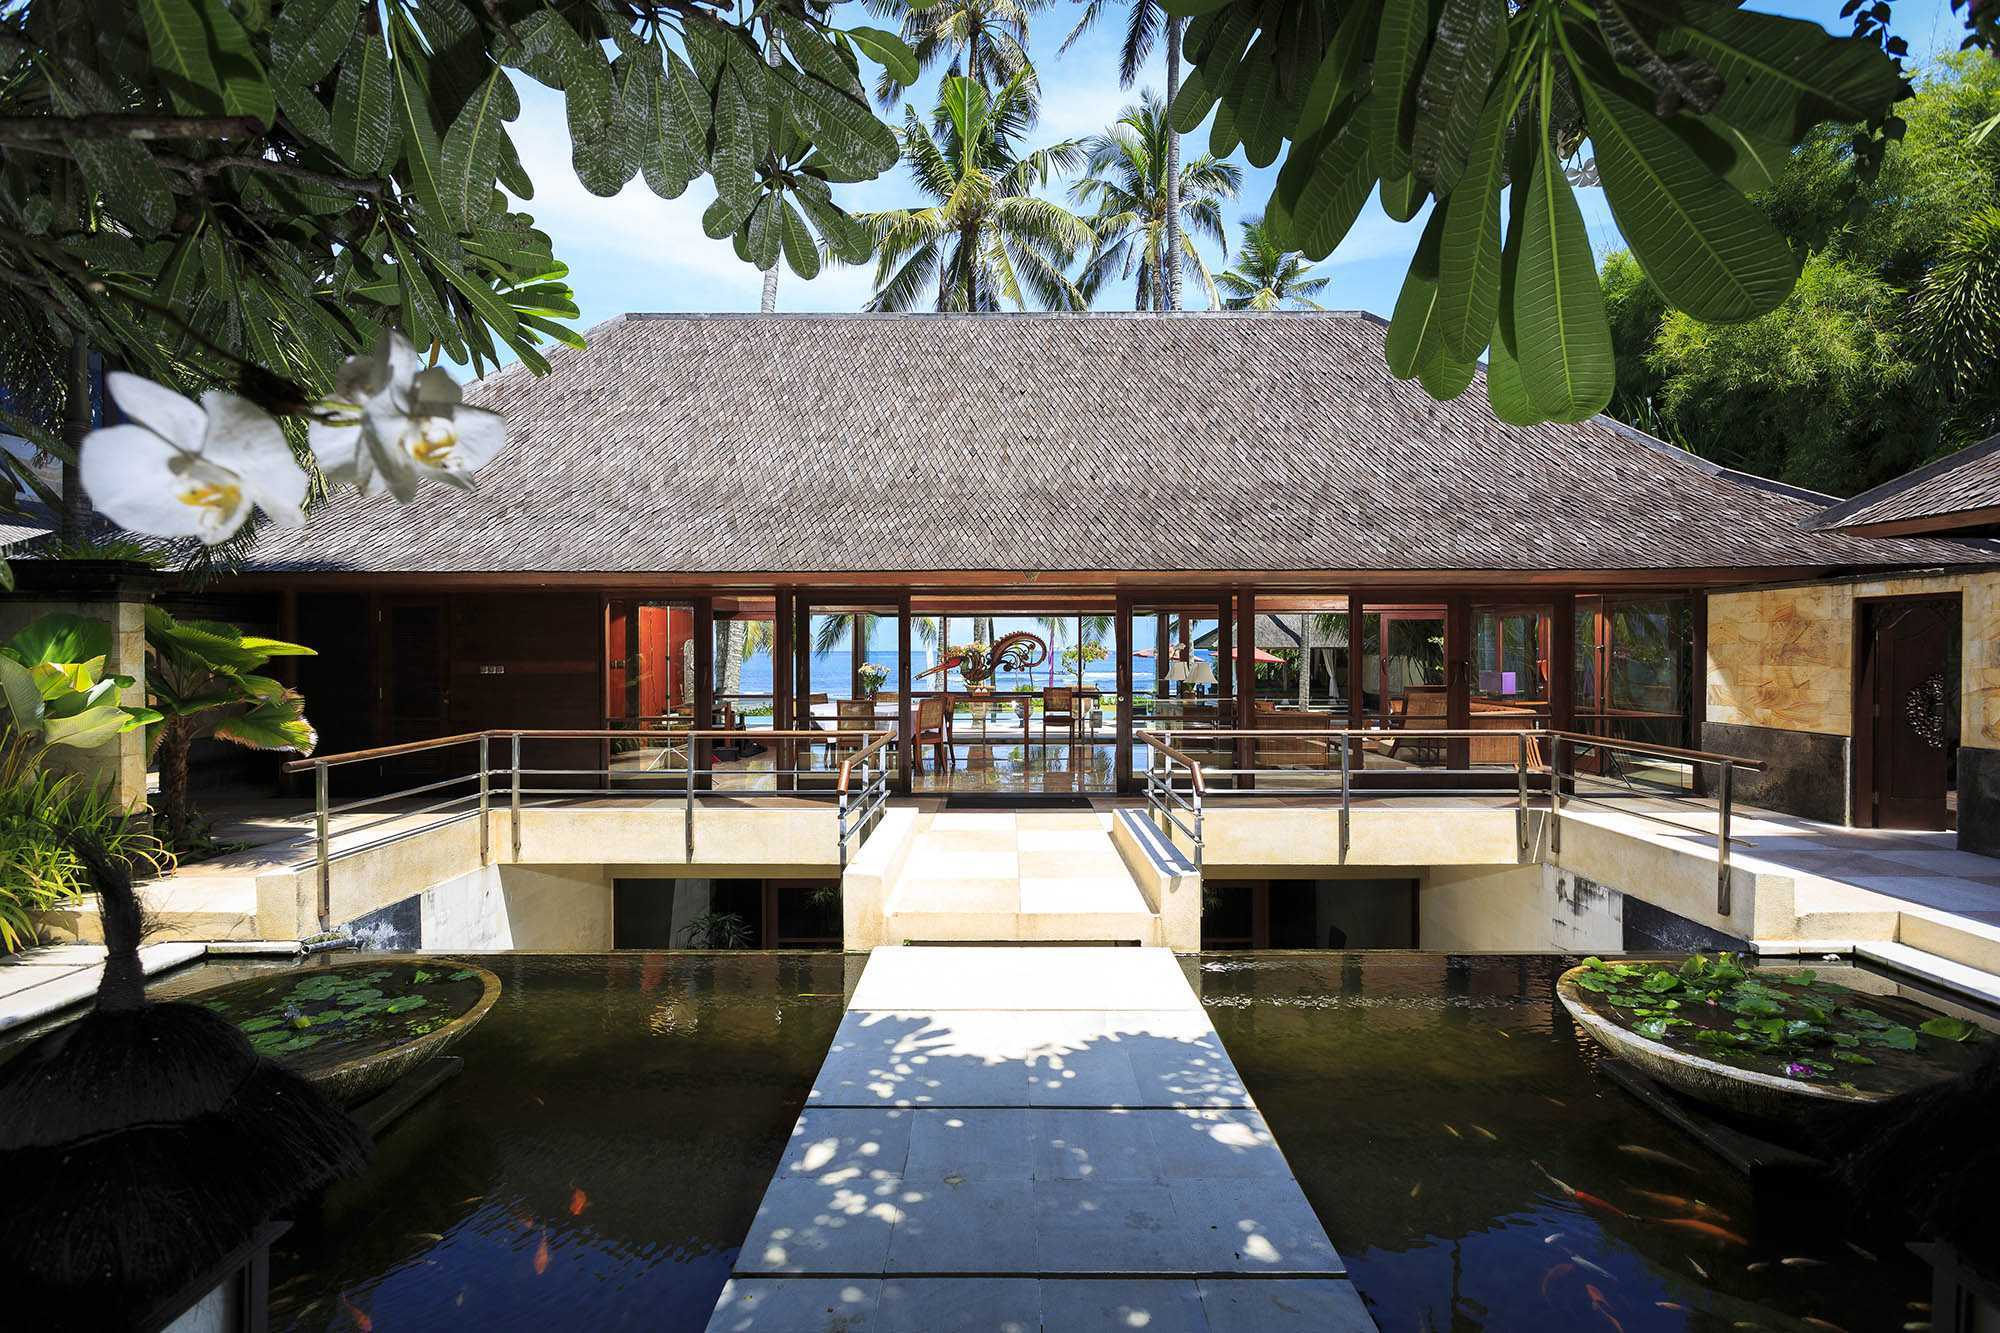 Agung Budi Raharsa | Architecture & Engineering Pushpapuri Villa - Bali Bali, Indonesia Bali, Indonesia Agung-Budi-Raharsa-Pushpapuri-Villa   88358